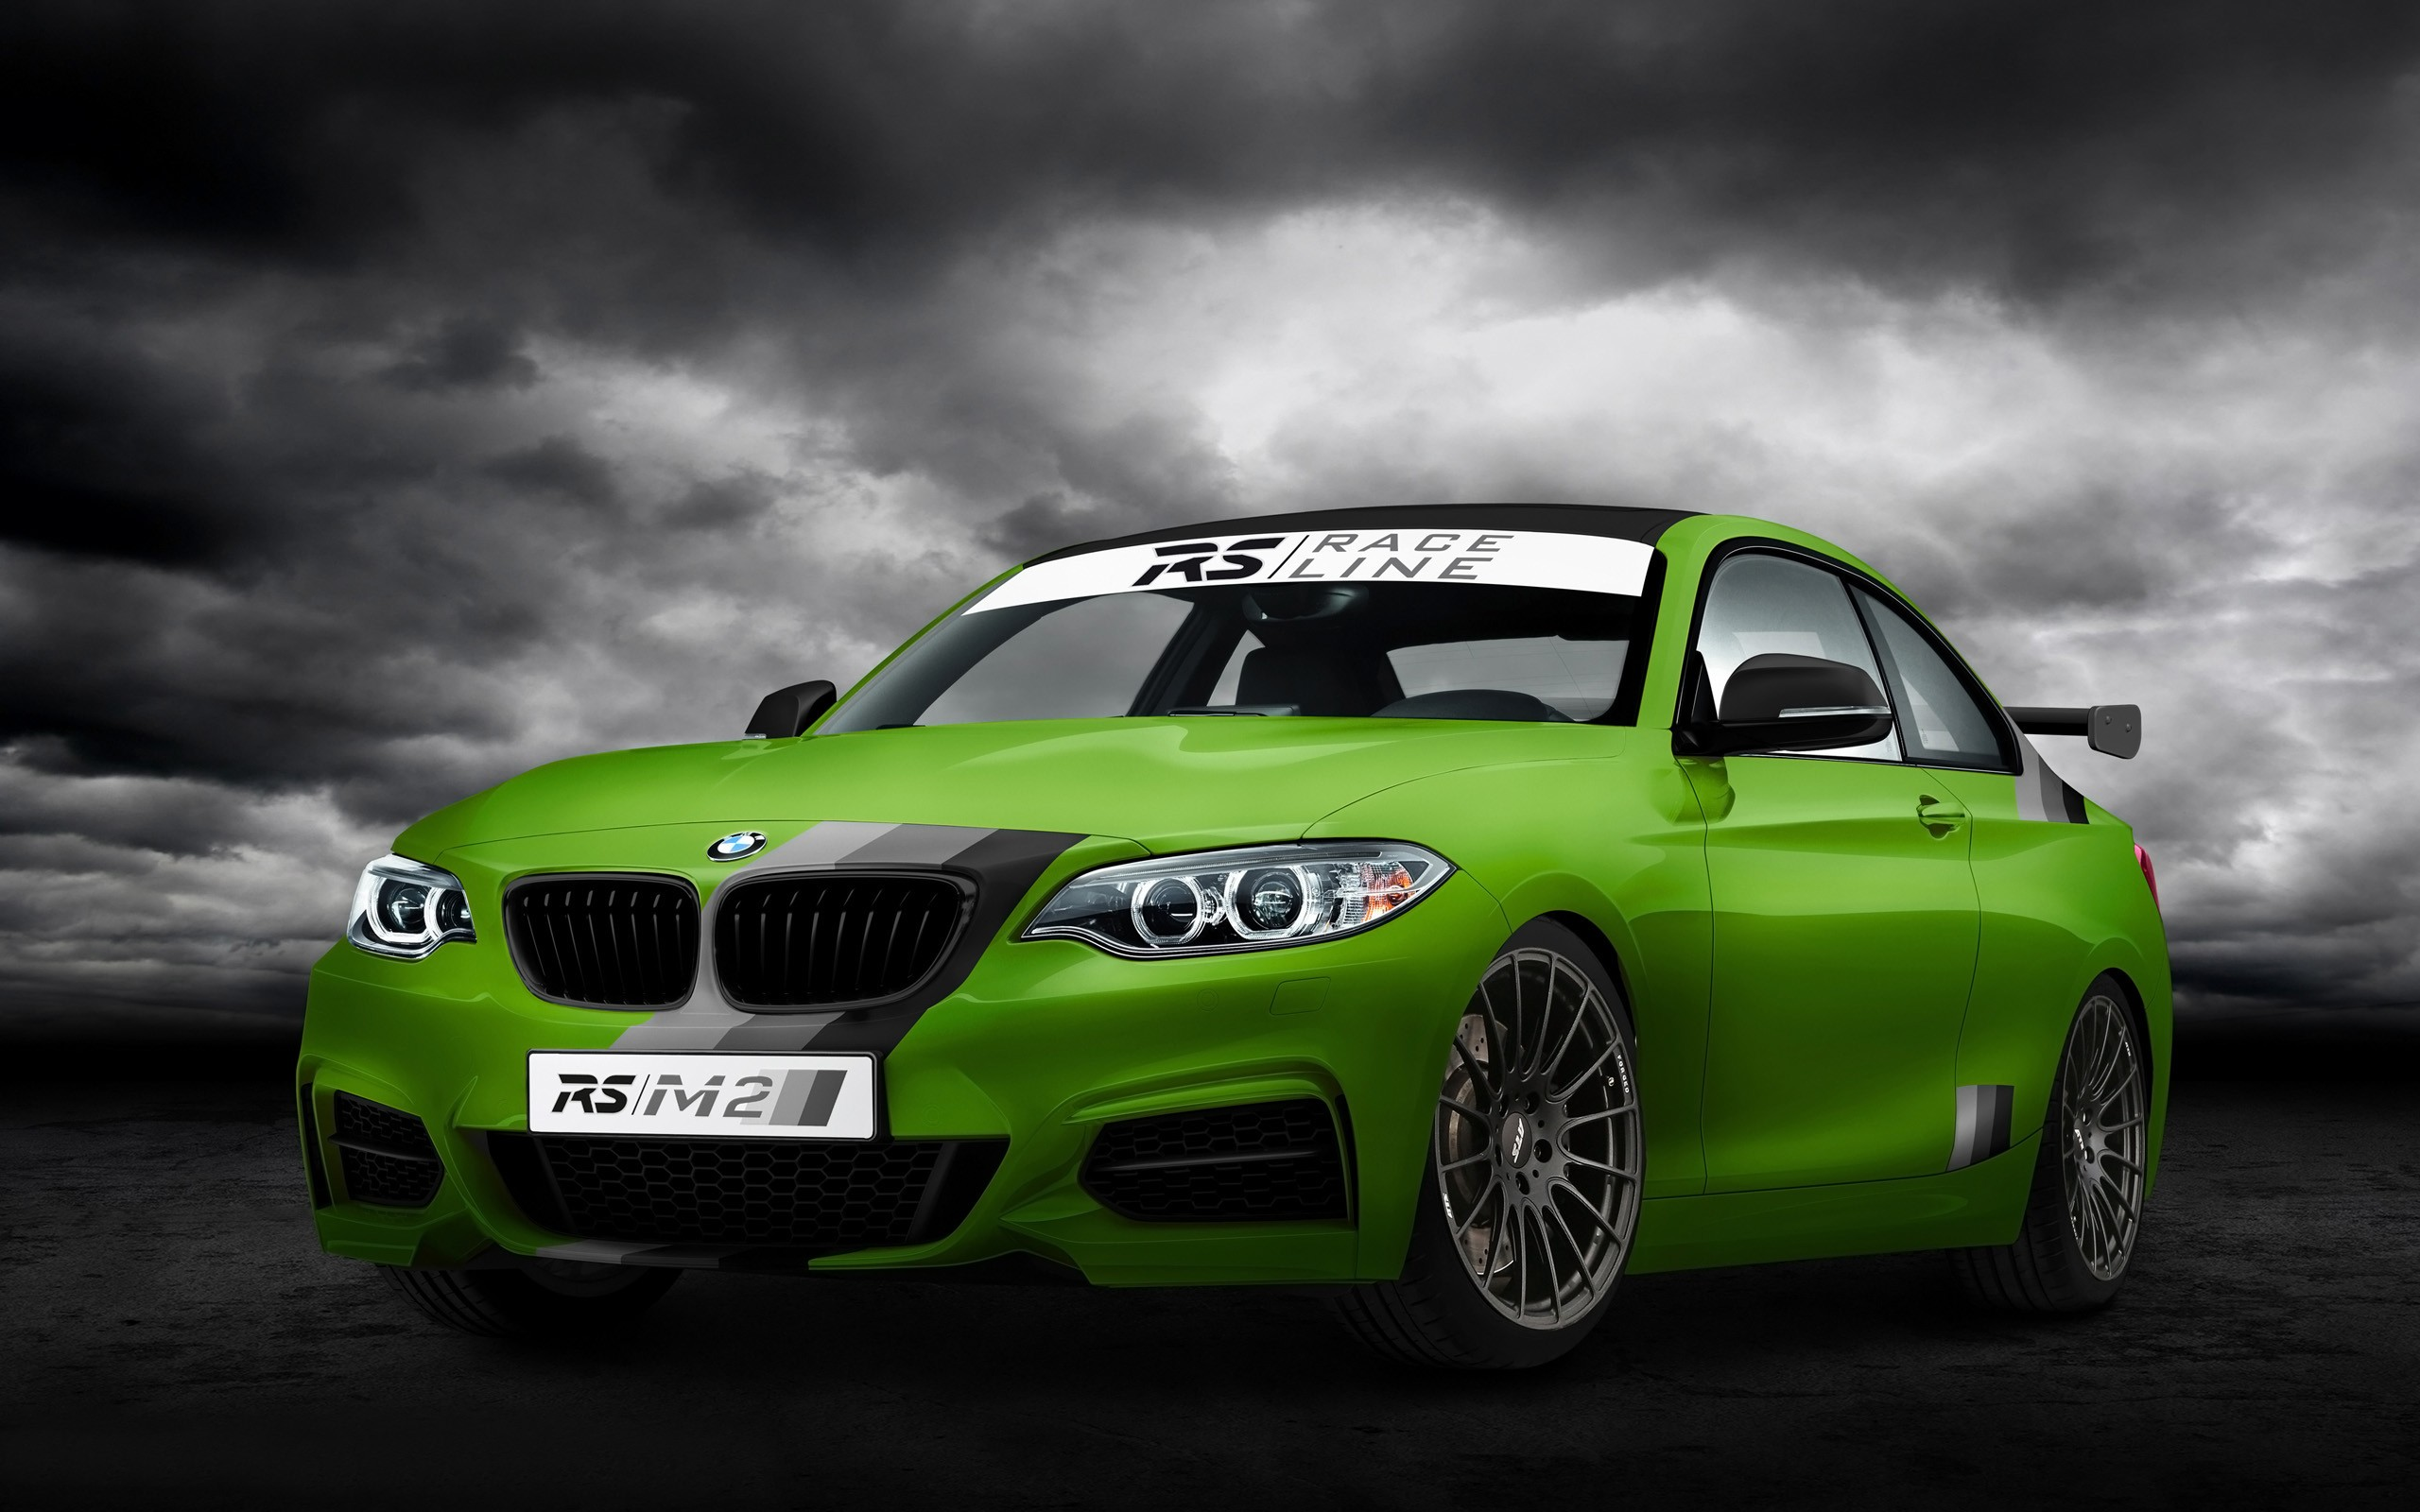 2014 RS RacingTeam BMW RSM235i Green Hell Edition ...